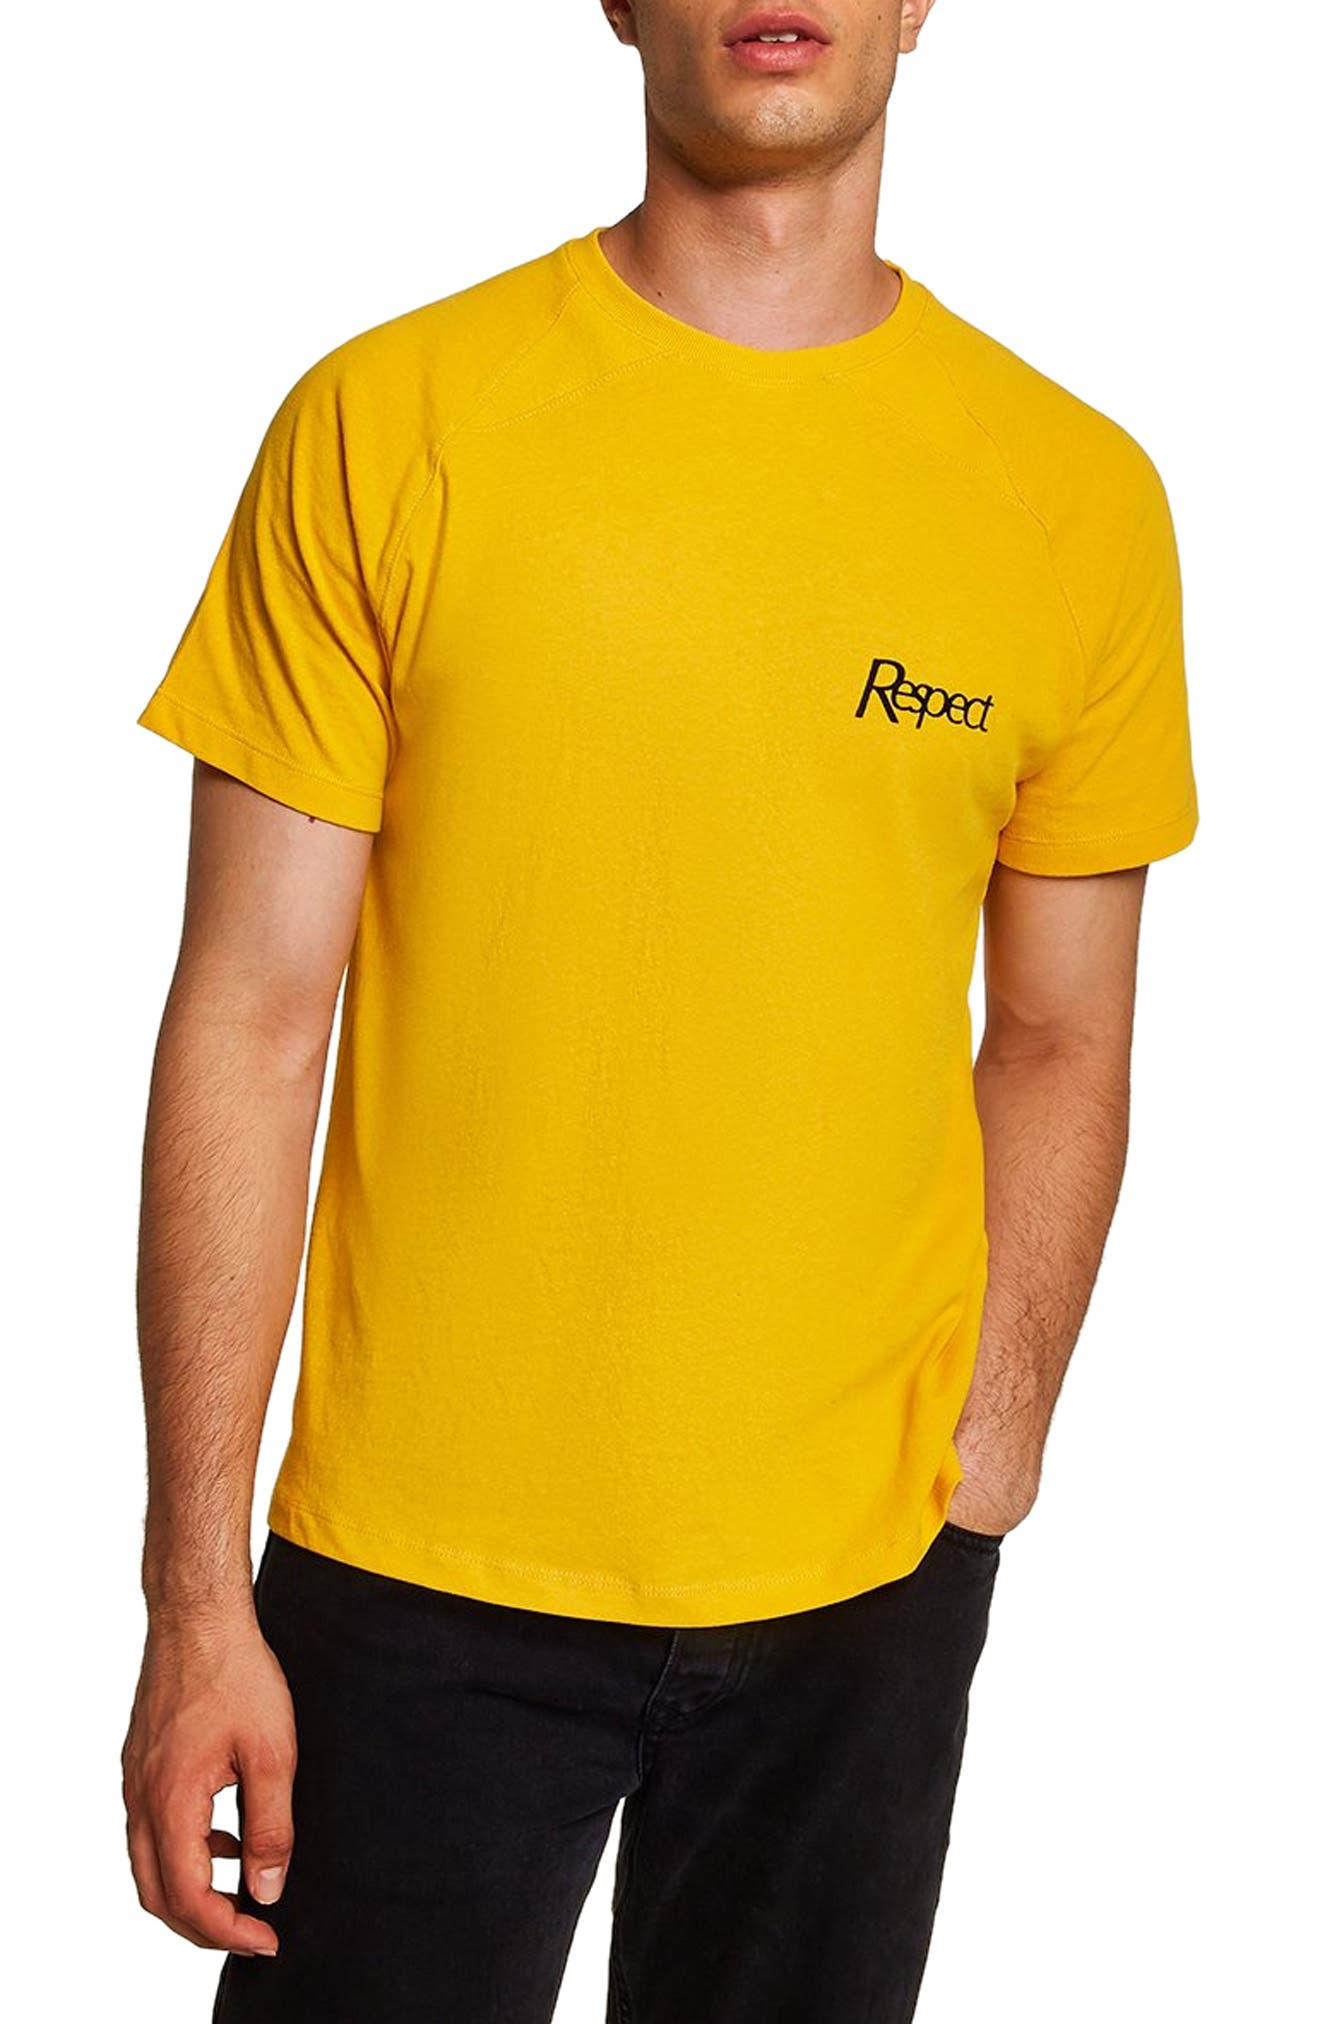 Respect Classic Fit T-Shirt,                             Main thumbnail 1, color,                             710